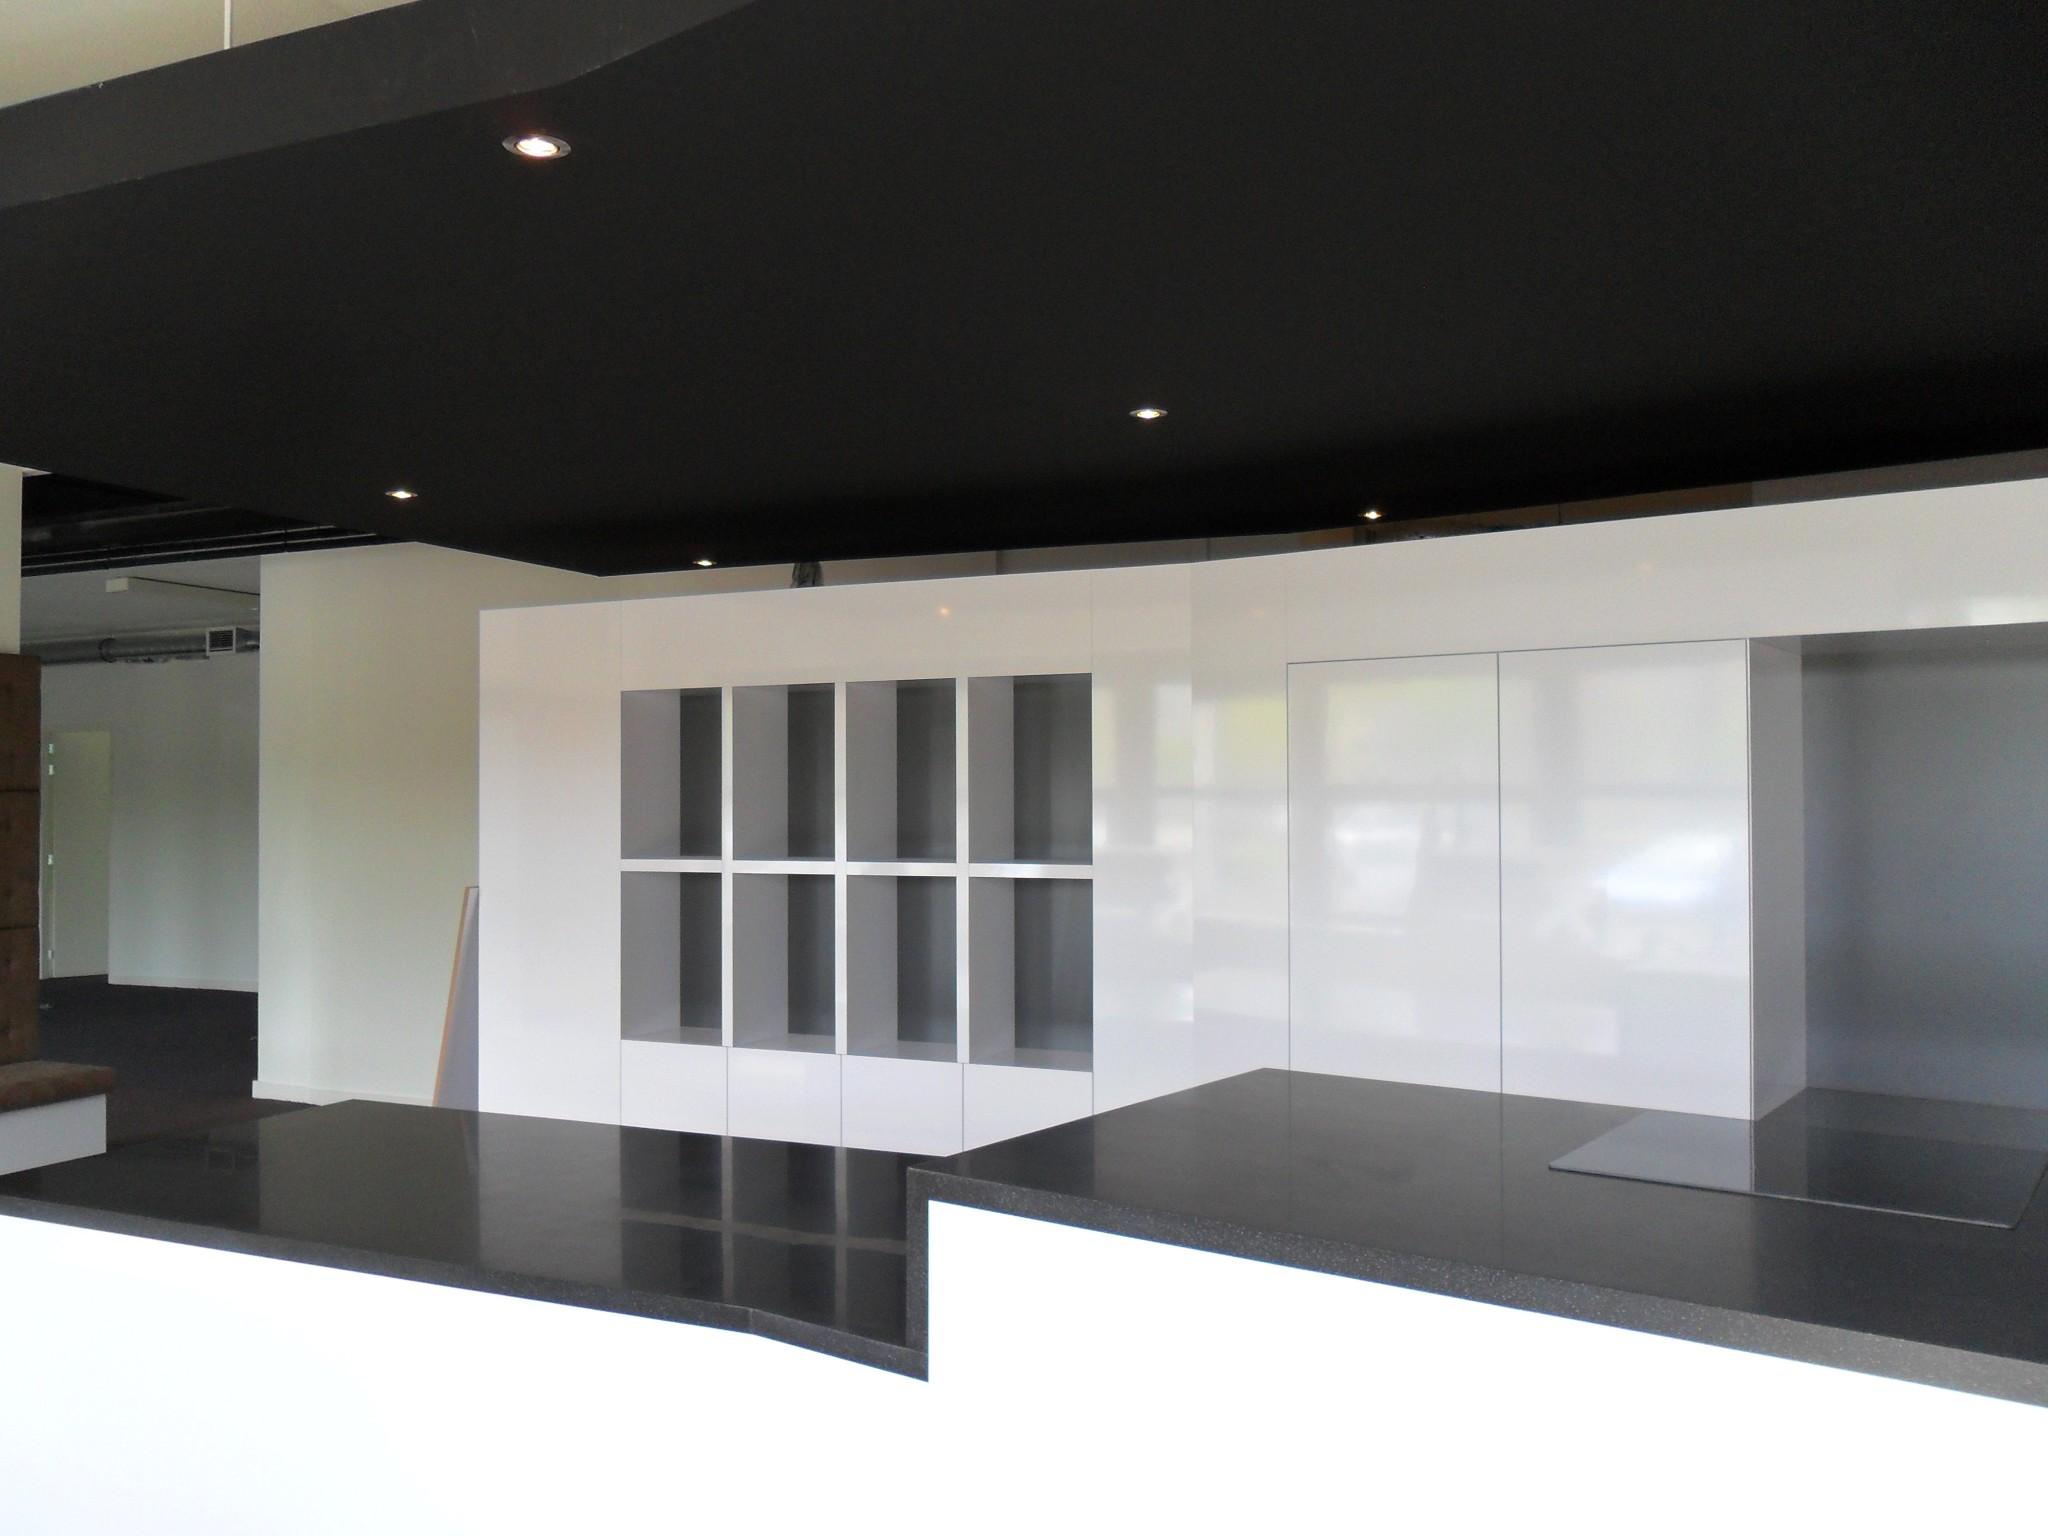 Slimhuis Sittard | Abels Interieur